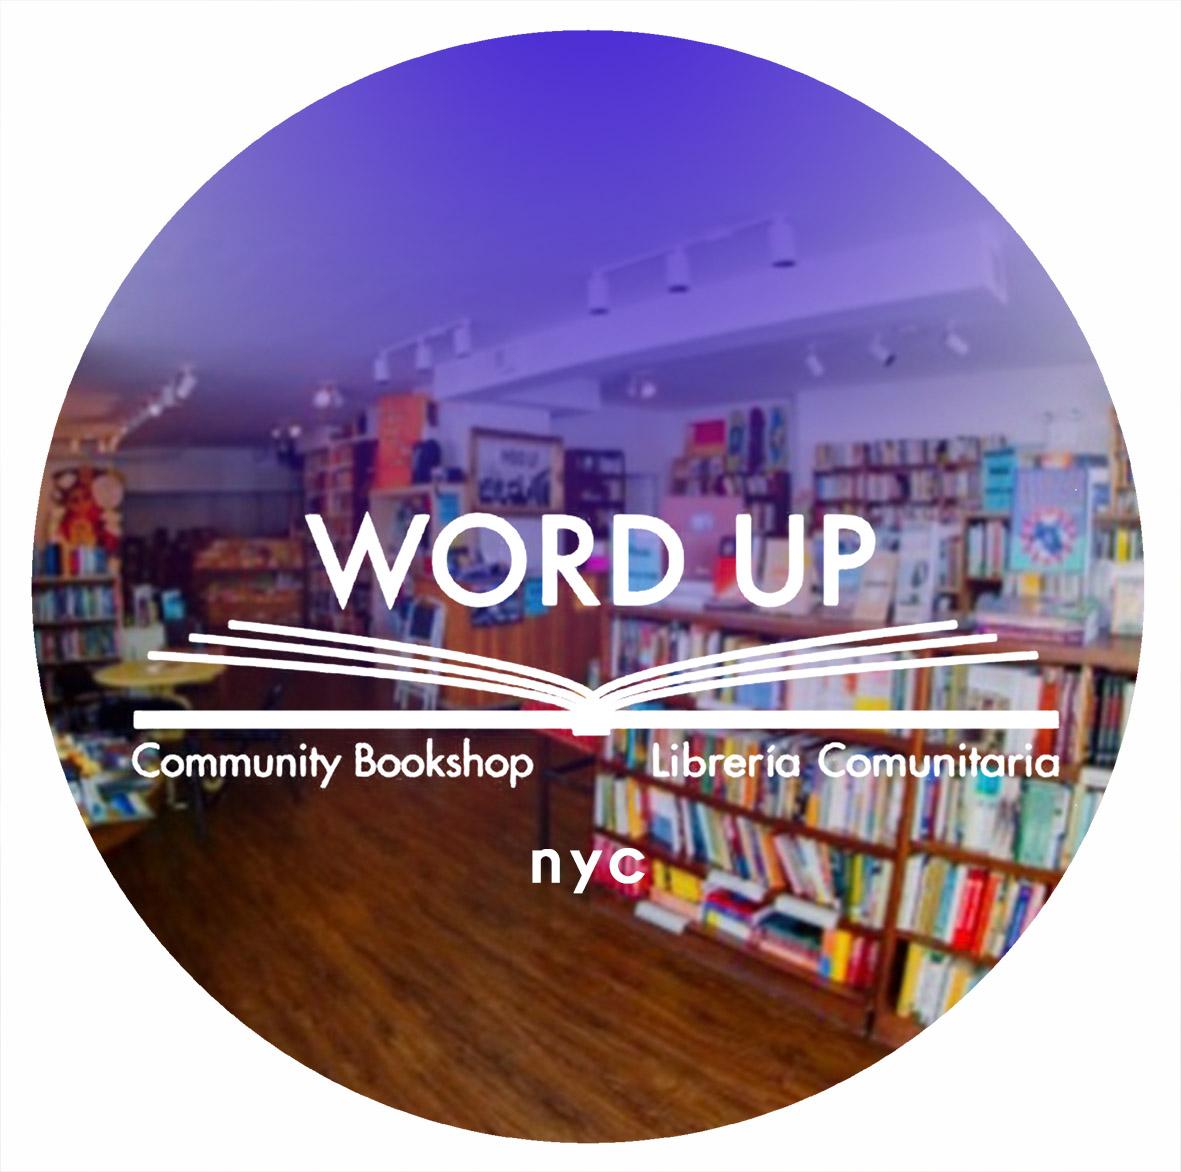 WORD UP COMMUNITY BOOKSHOP 2113 Amsterdam Avenue, New York, NY 10032